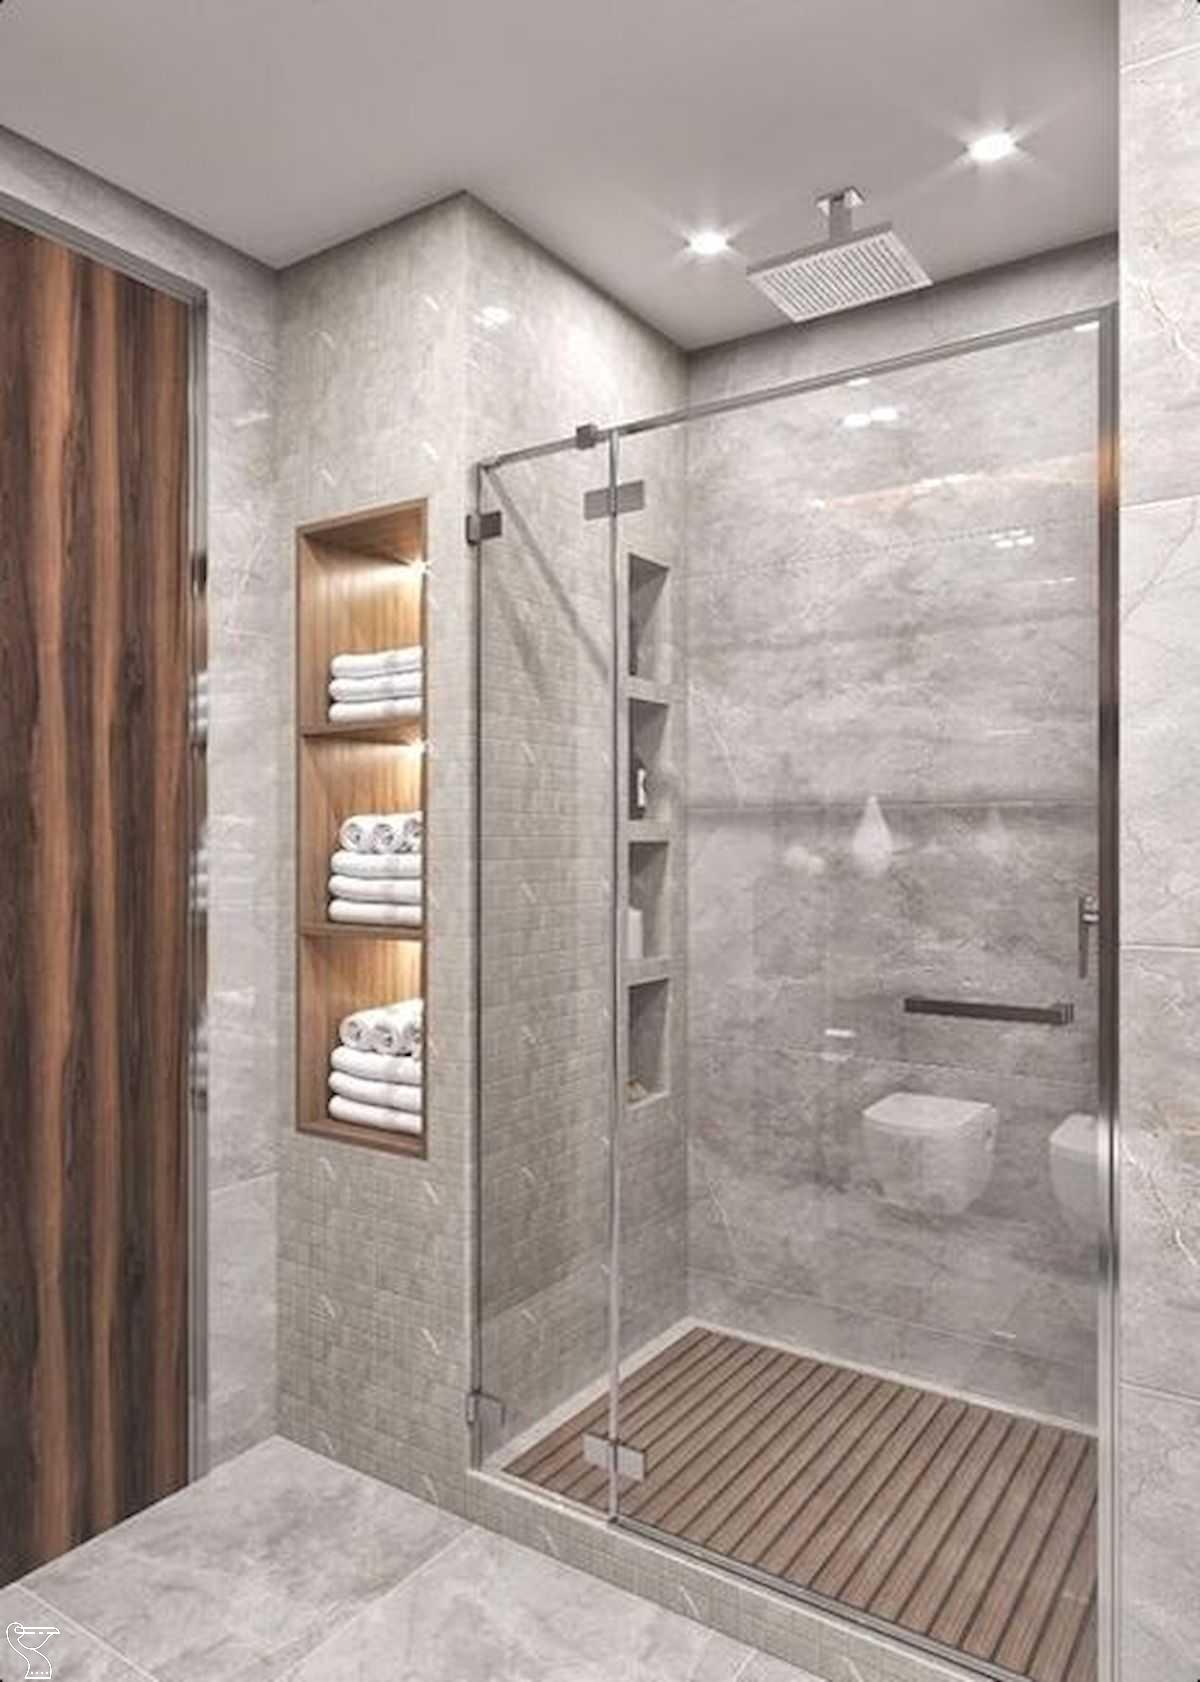 Efozon Home Decor In 2020 Small Bathroom Makeover Bathroom Interior Design Small Bathroom Remodel